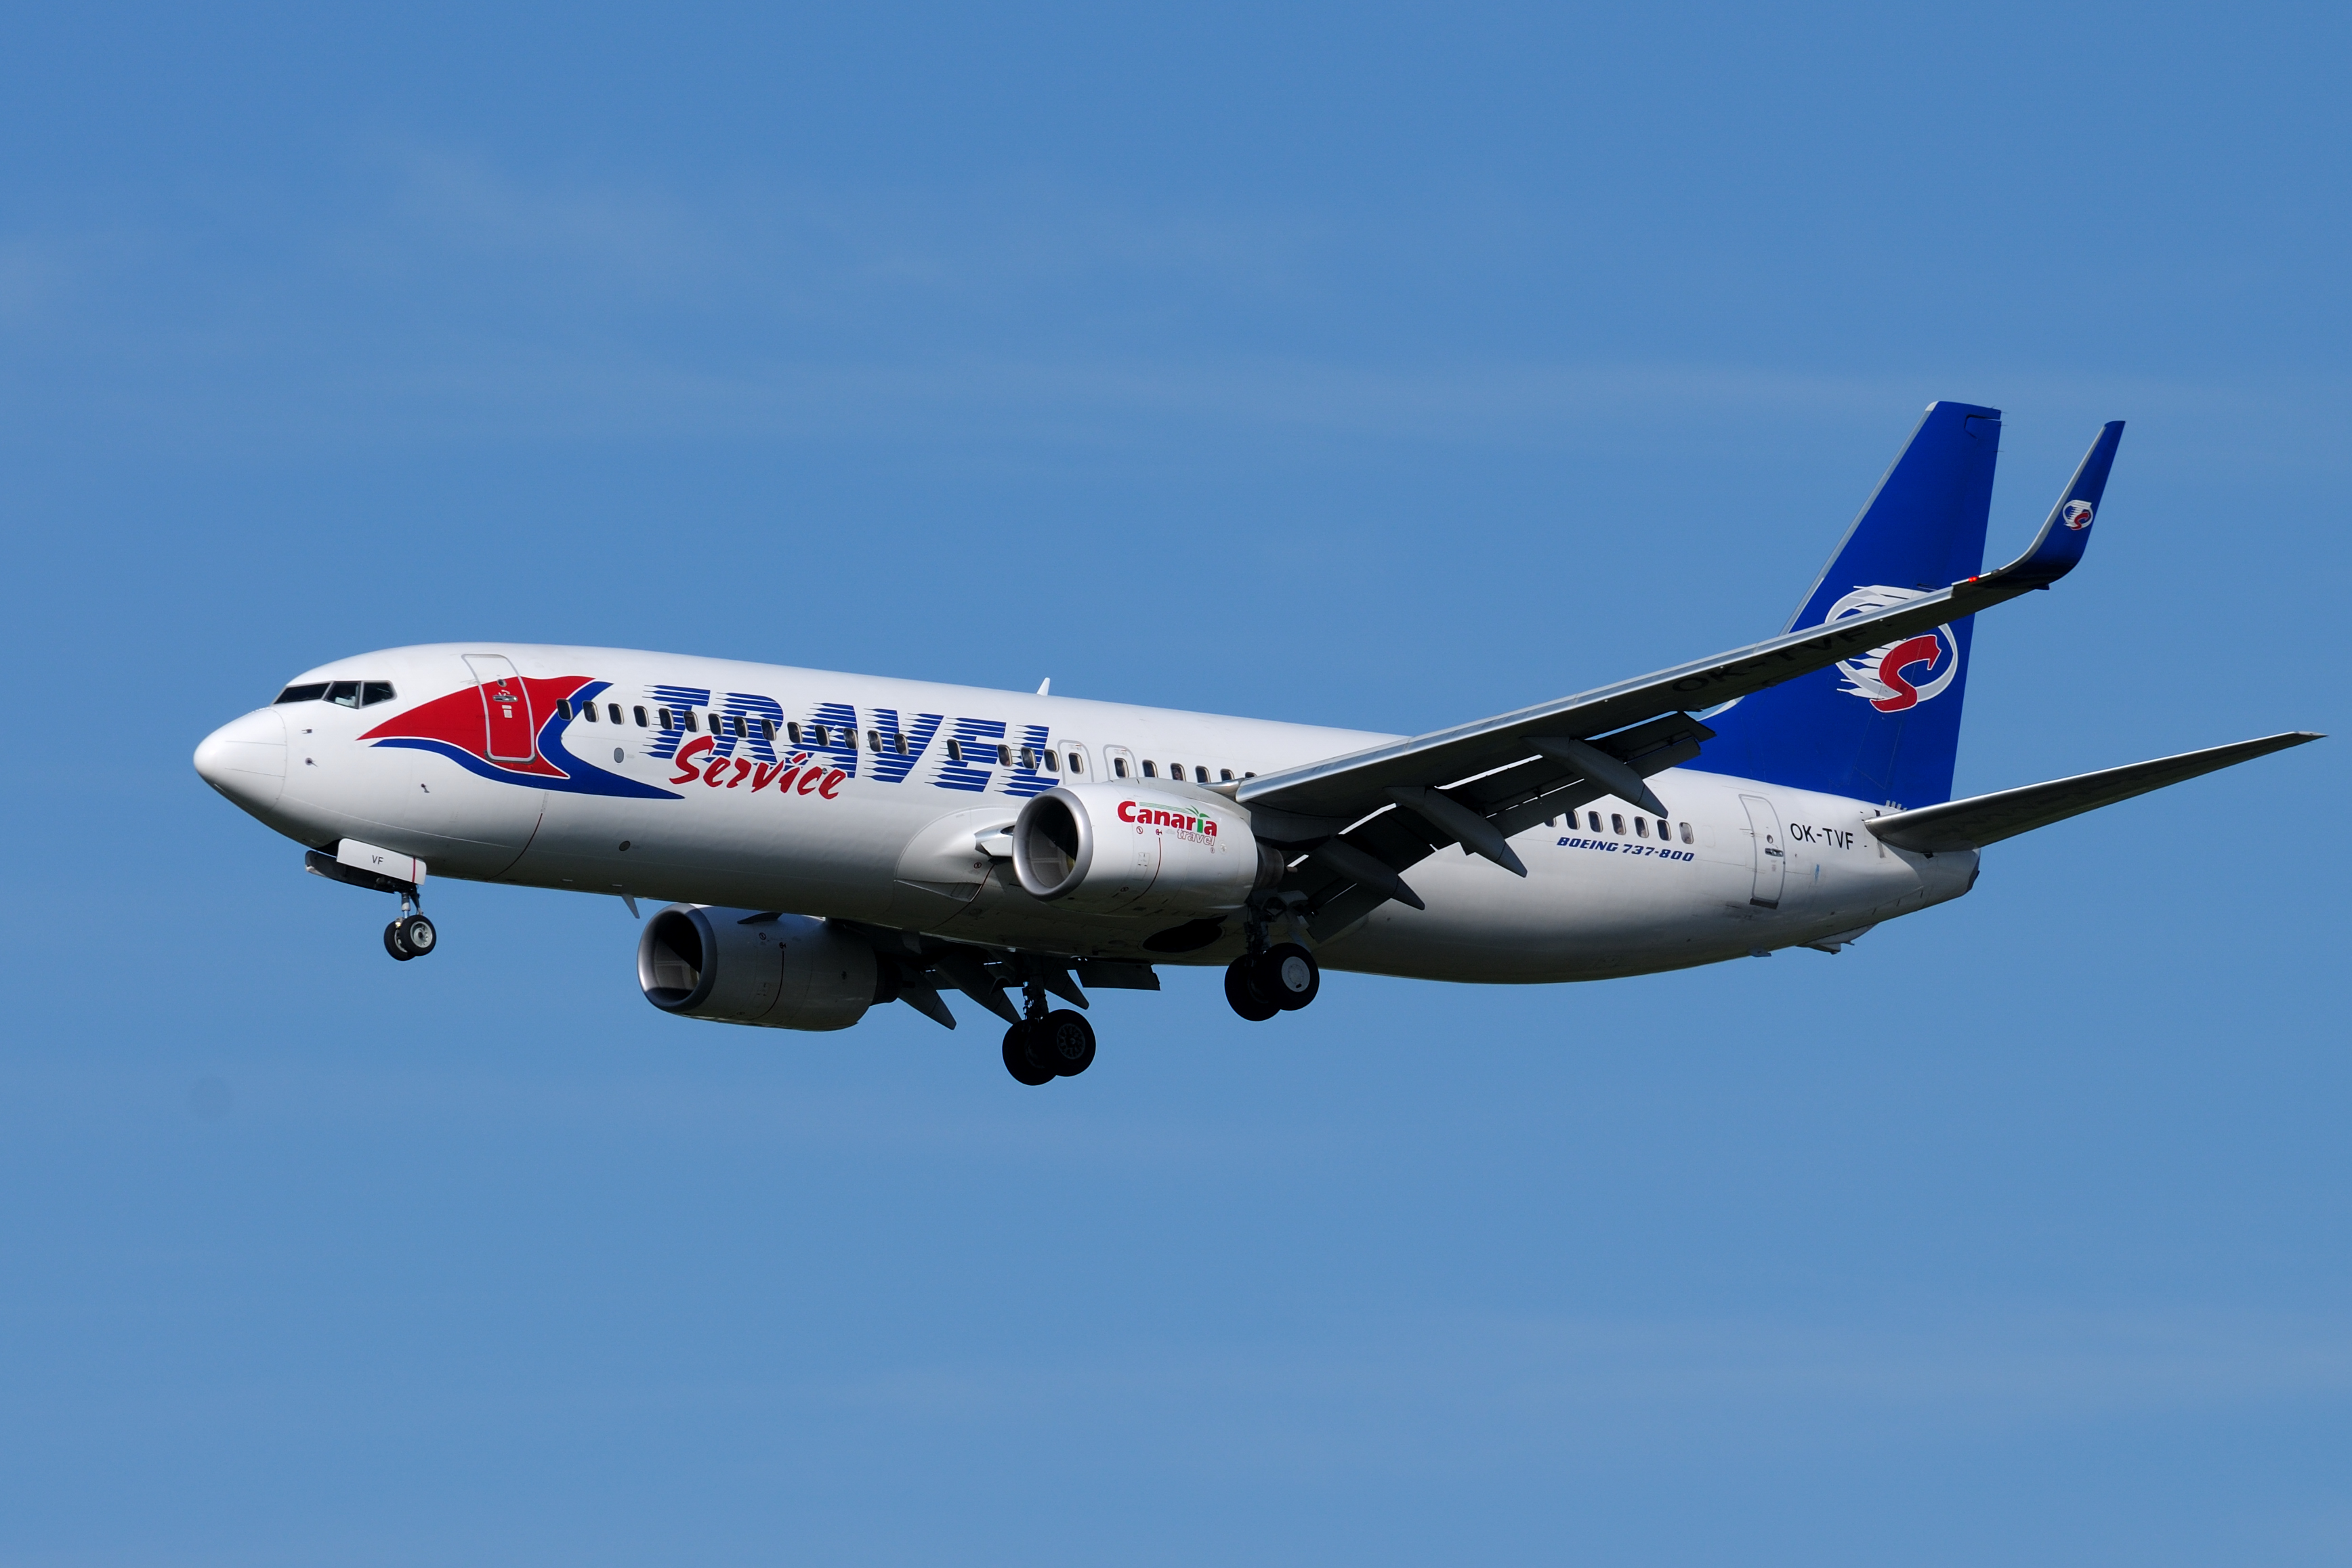 File:Boeing 737-8FH OK-TVF Travel Service (3512072647).jpg